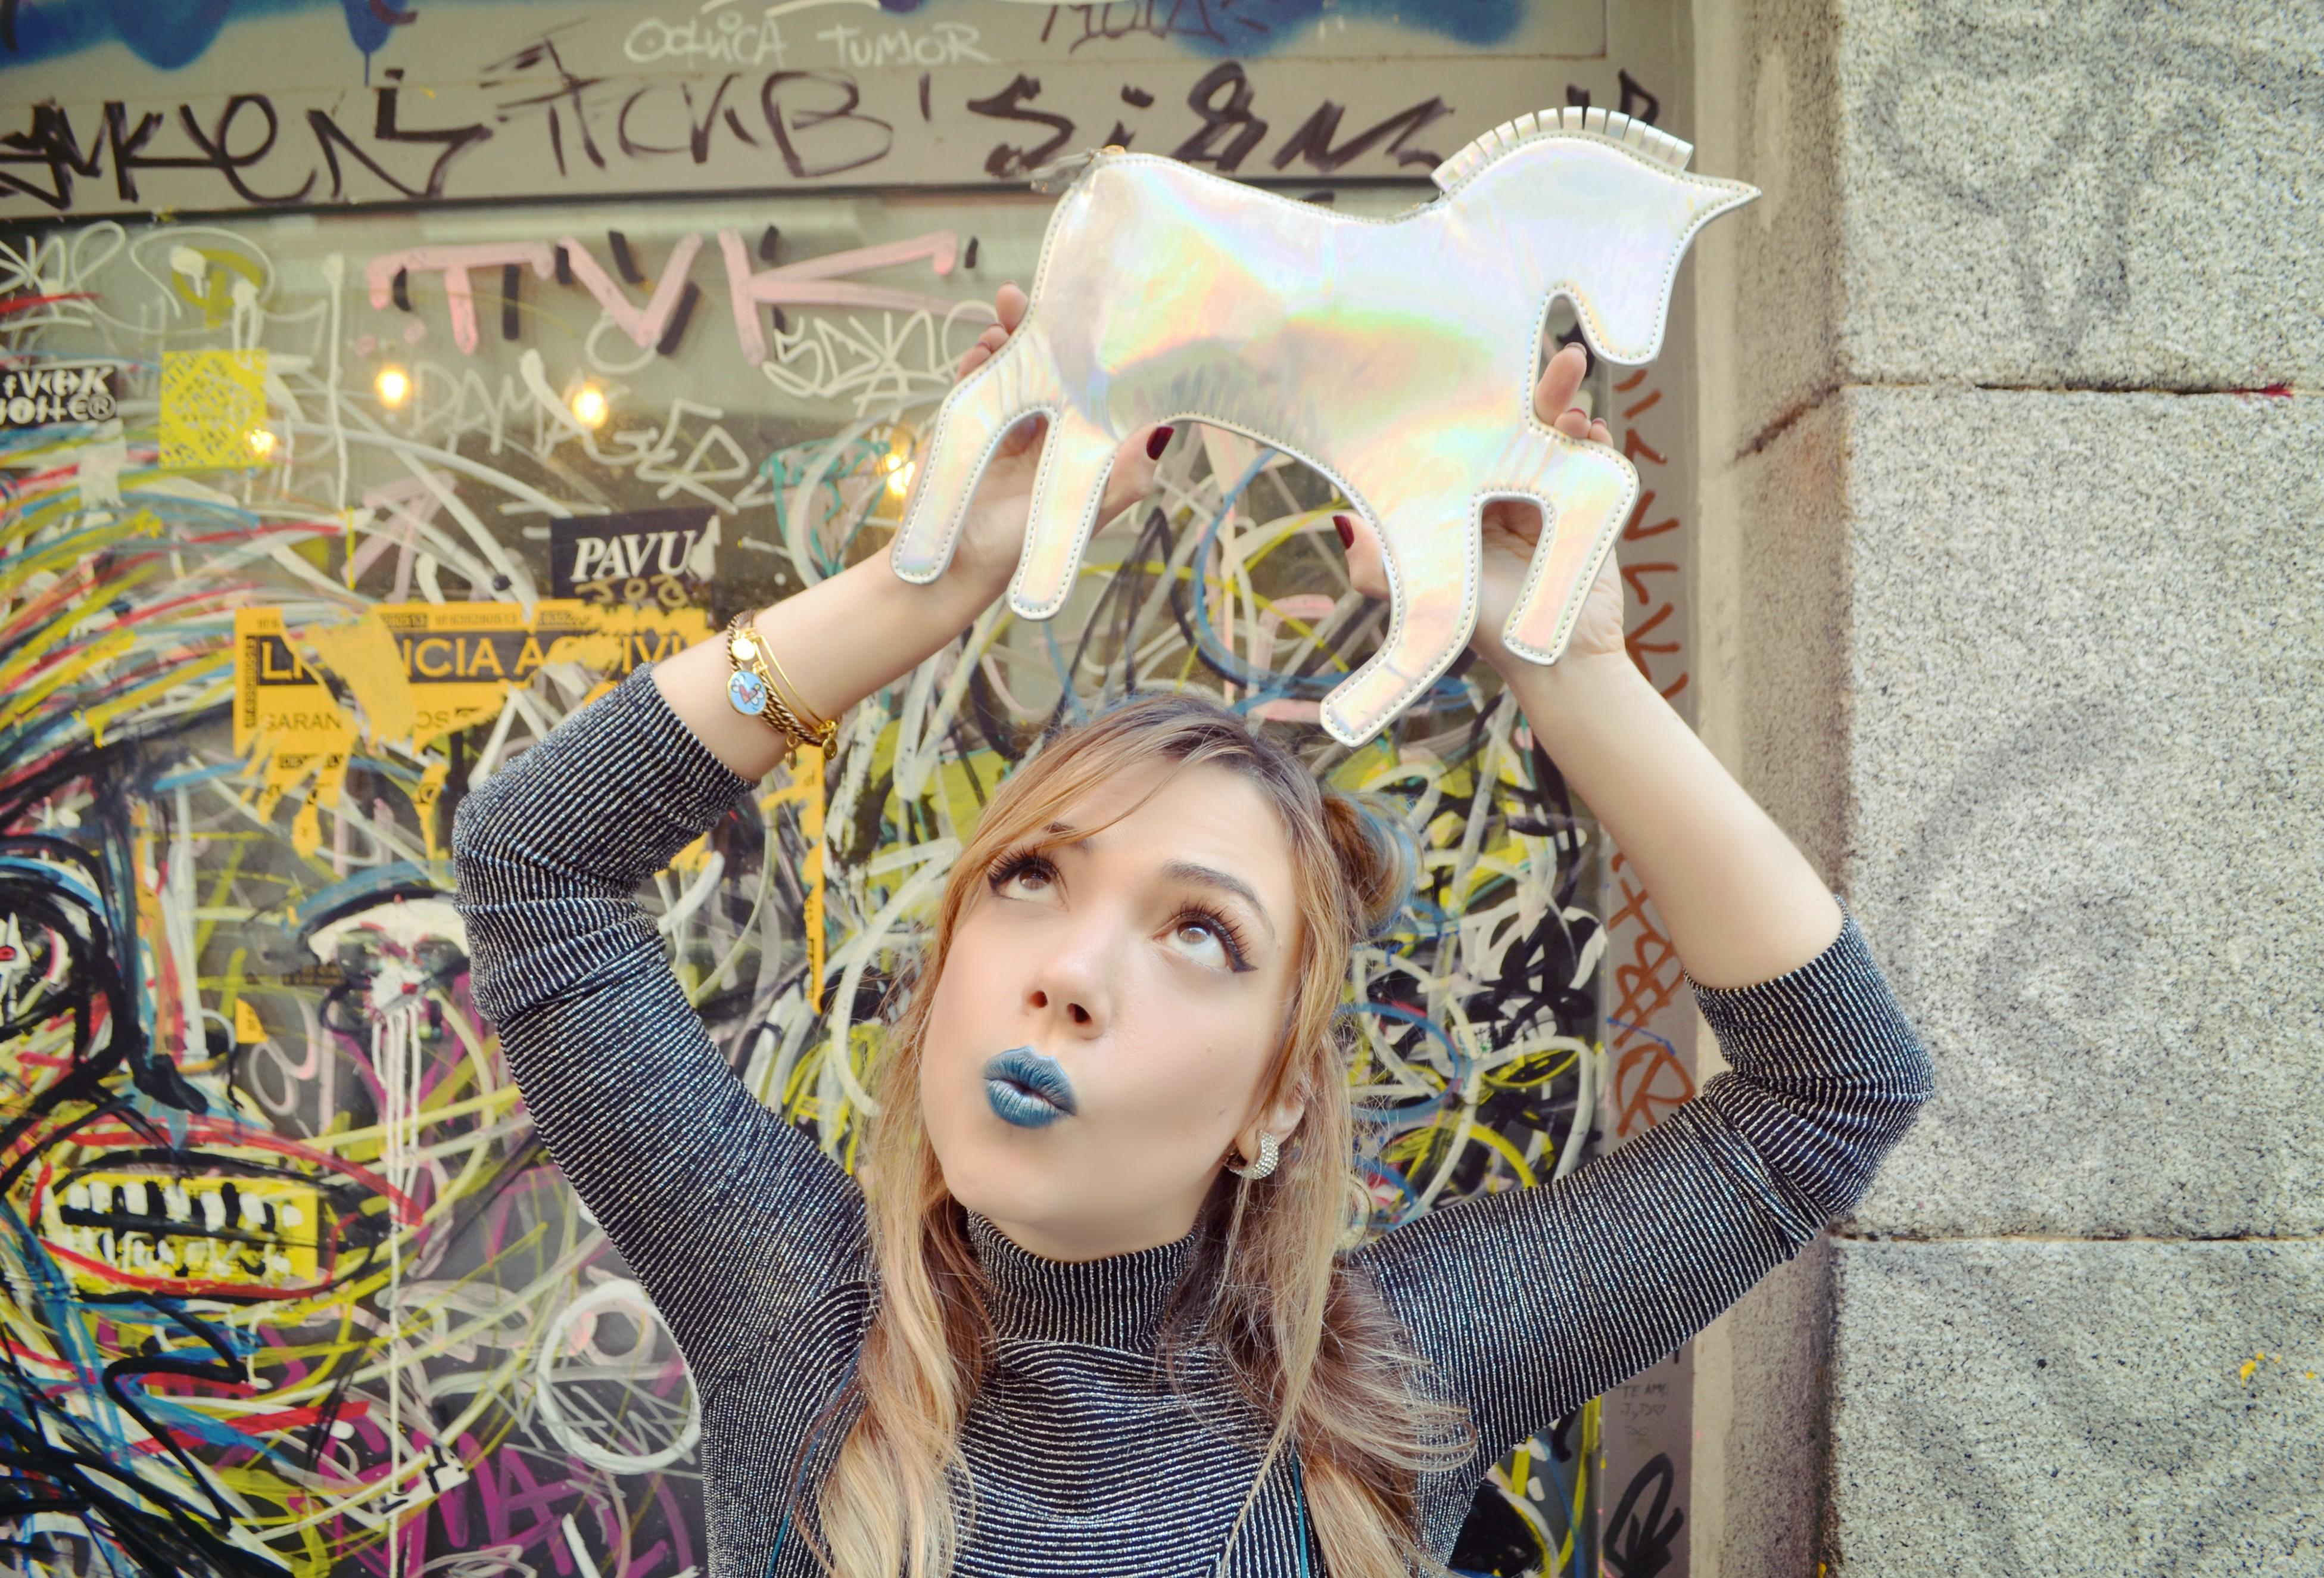 ChicAdicta-blog-de-moda-bolso-de-unicornio-Chic-Adicta-bershka-top-alexandni-bracelets-nyx-PiensaenChic-Piensa-en-Chic